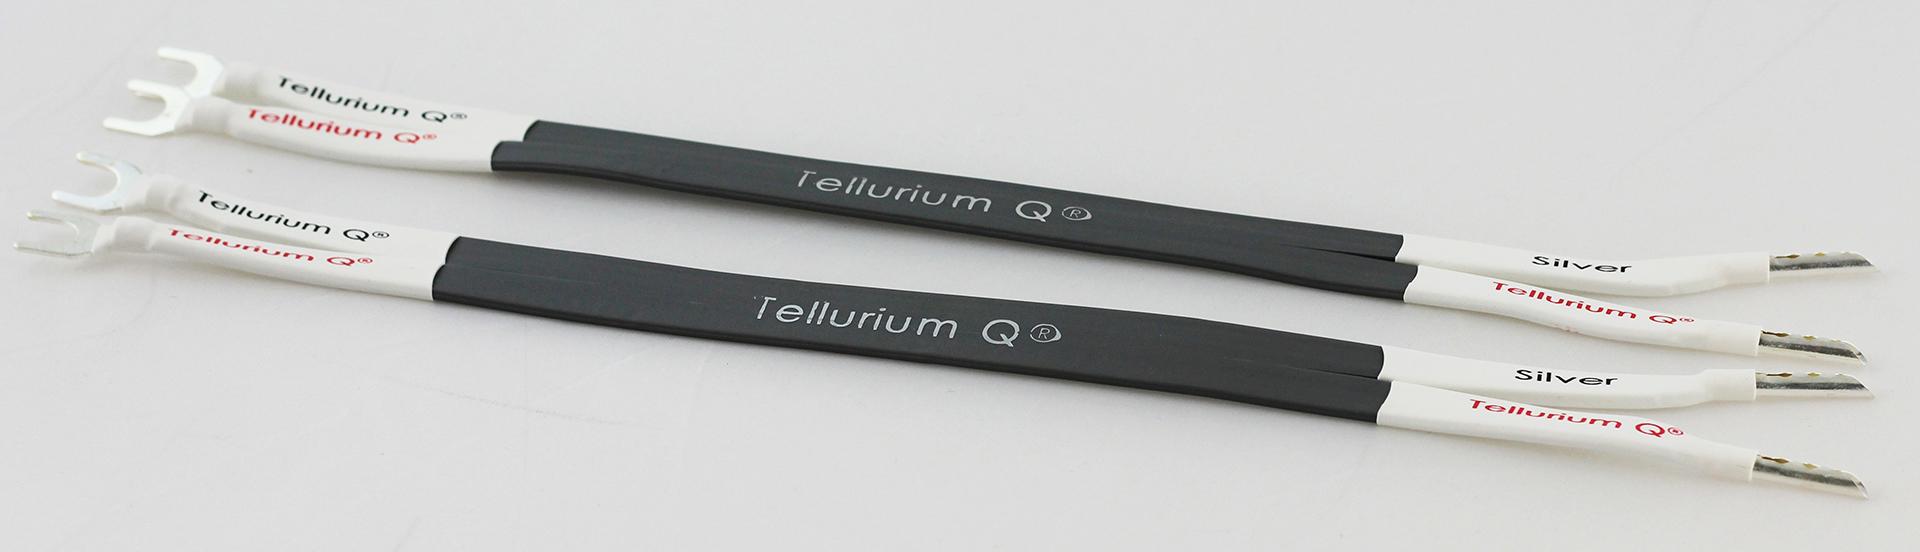 Tellurium Q | Silver | Lautsprecher Kabel